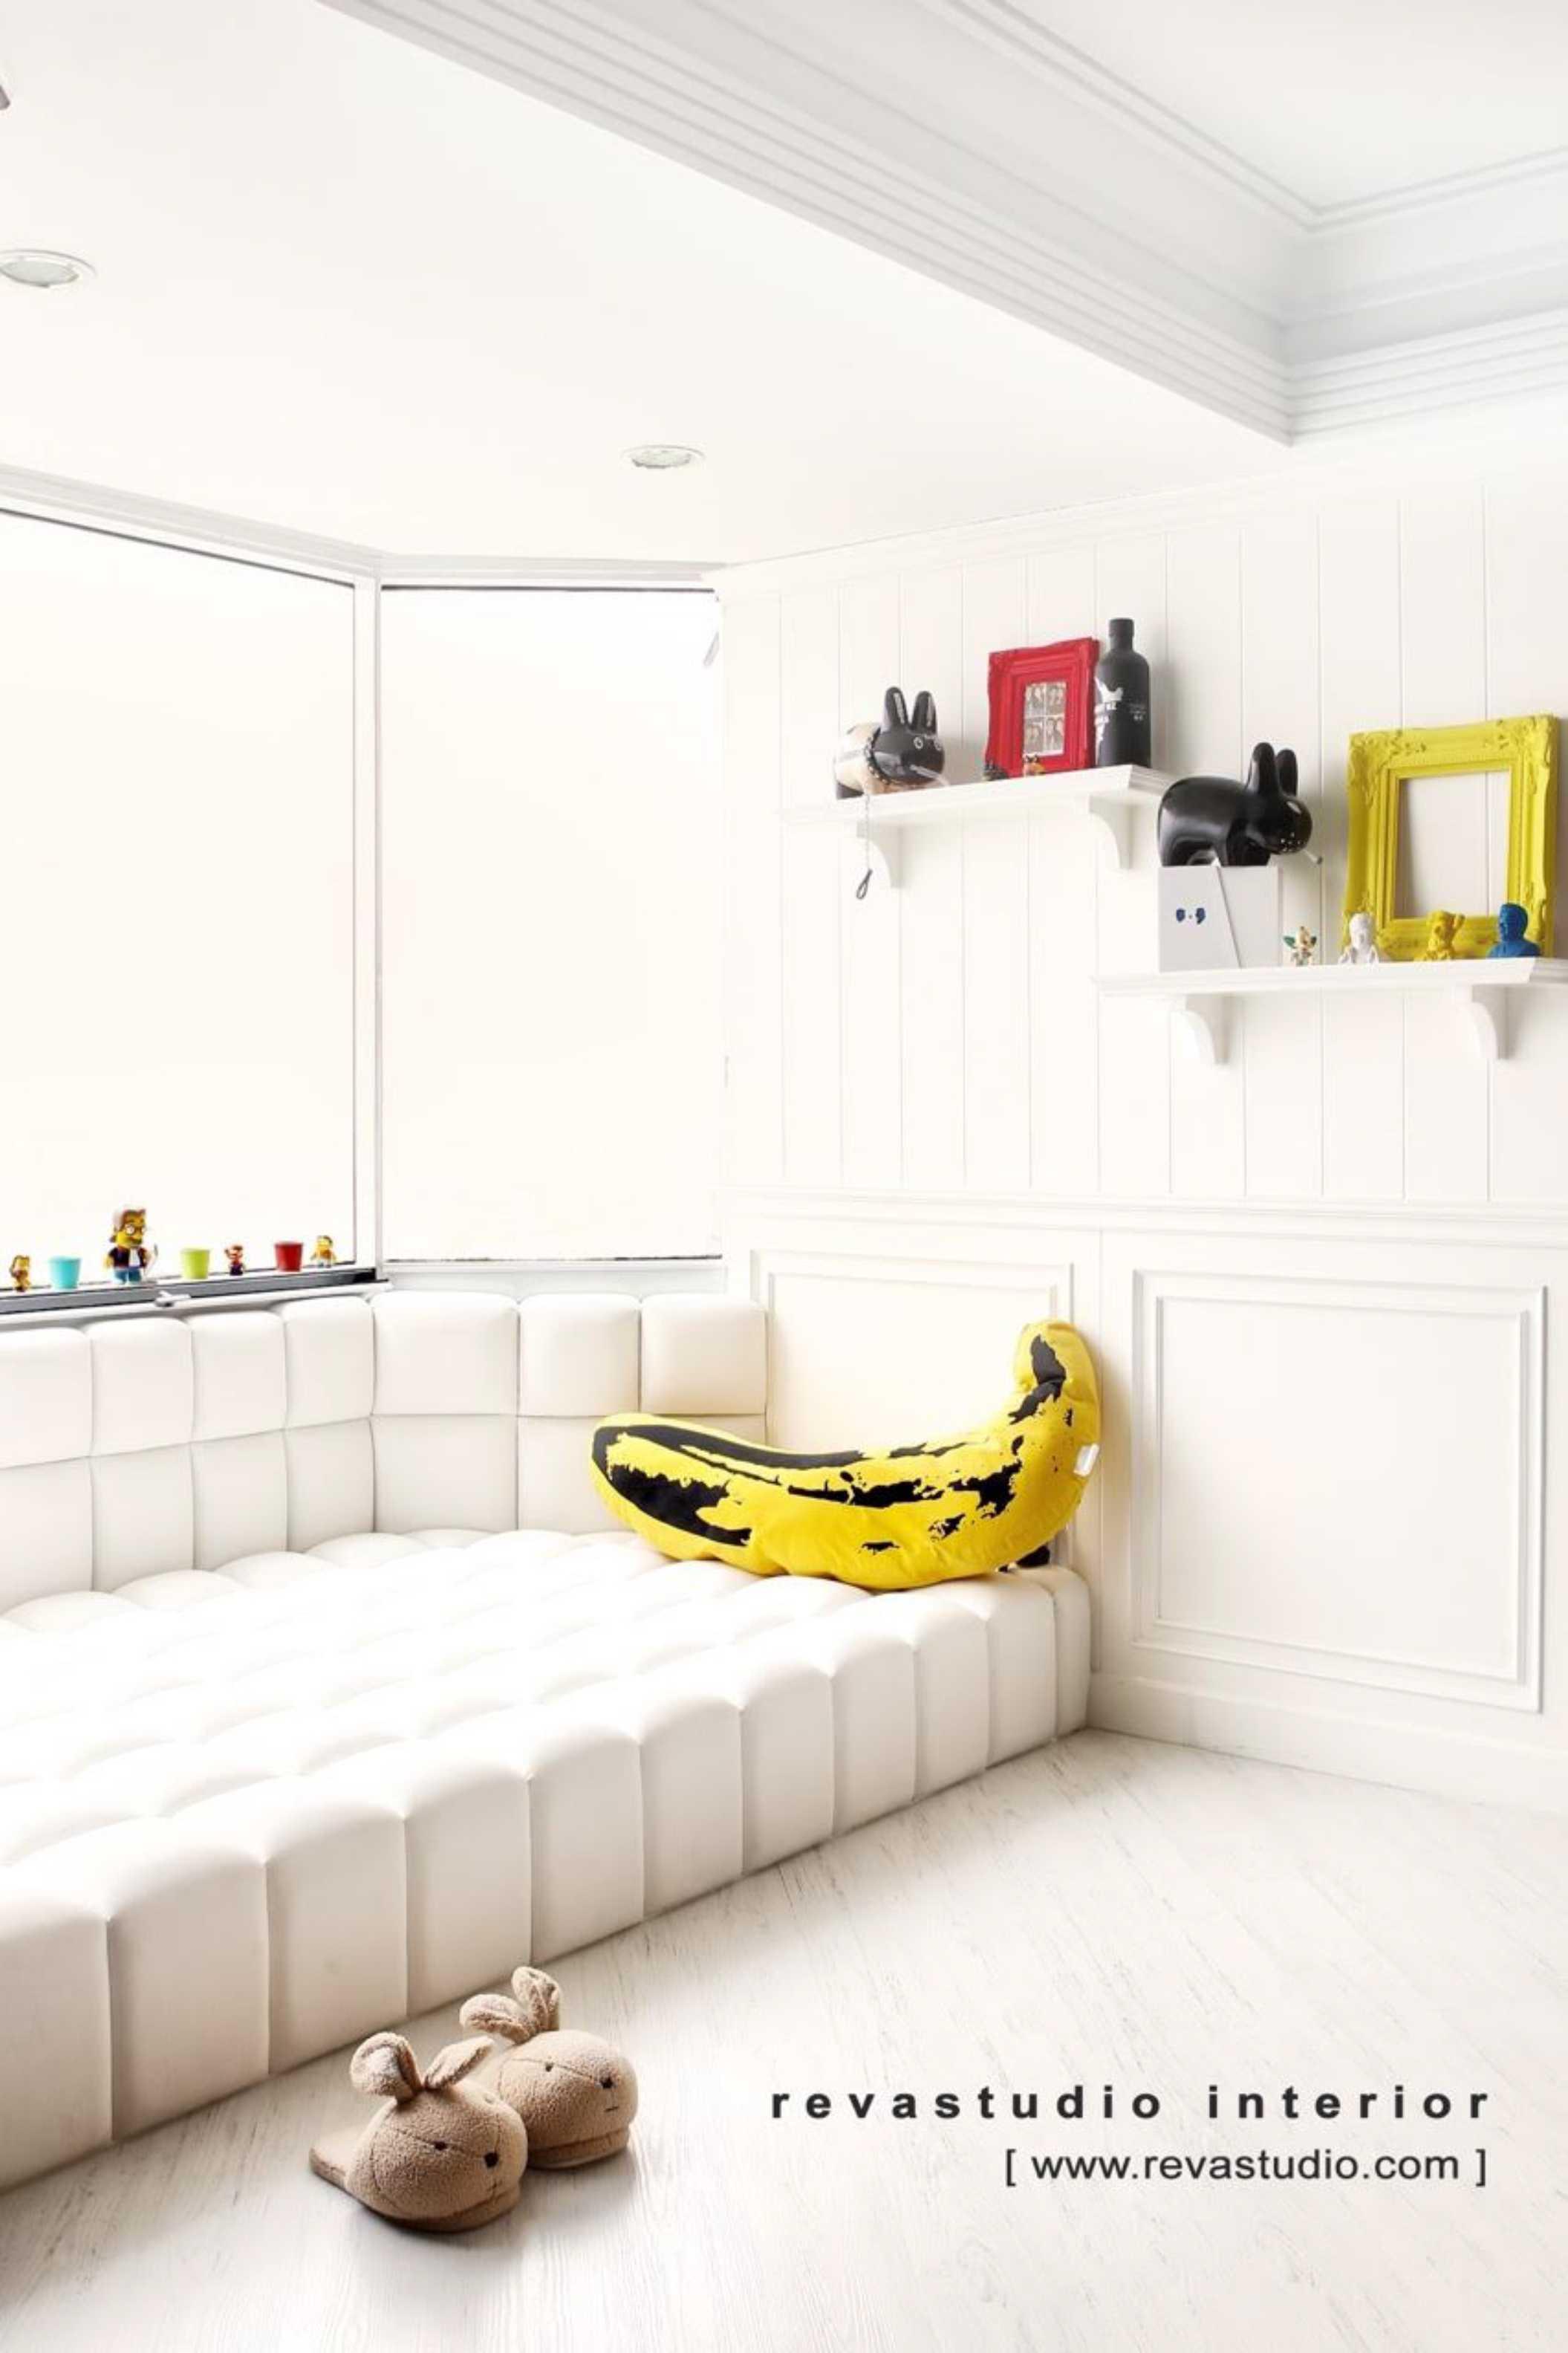 Revano Satria The Lego Apartment Jakarta, Indonesia Jakarta, Indonesia Master Bedroom   15537